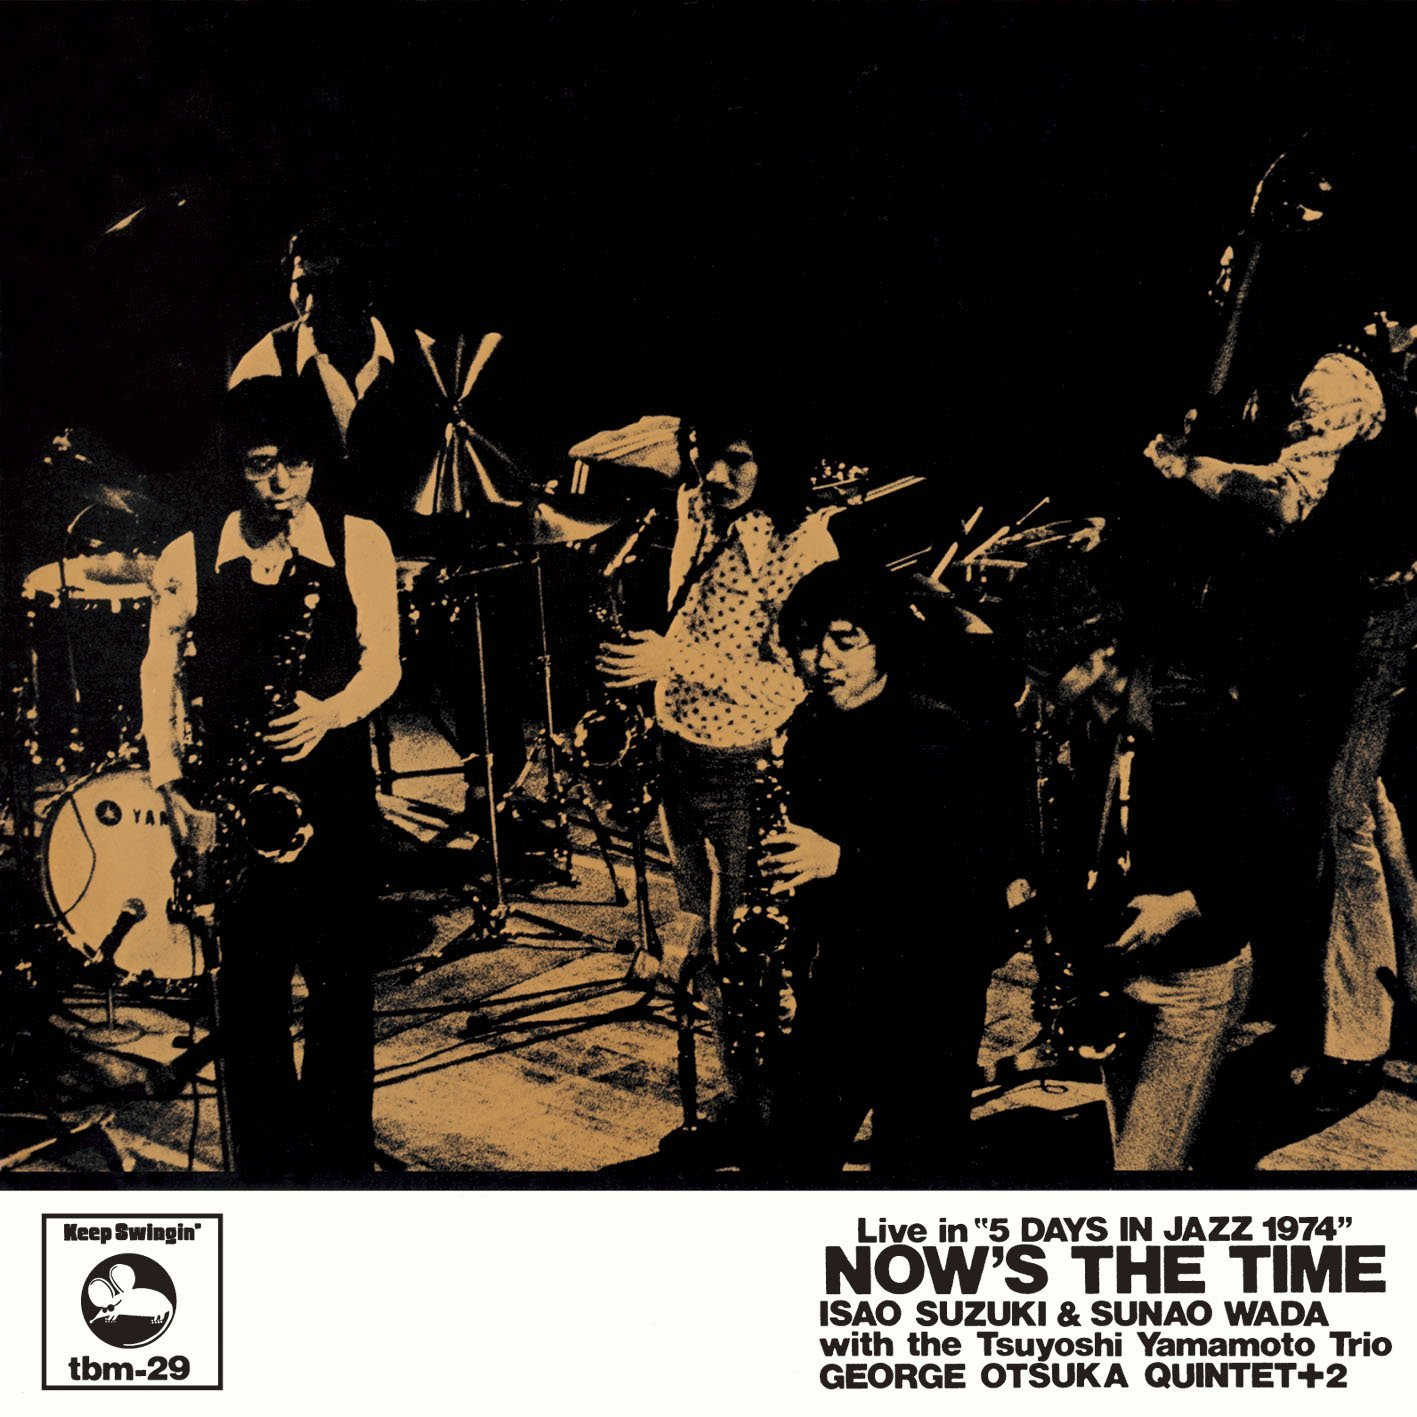 『NOW'S THE TIME』鈴木勲&和田直 with 山本剛トリオ、ジョージ大塚クインテット+2